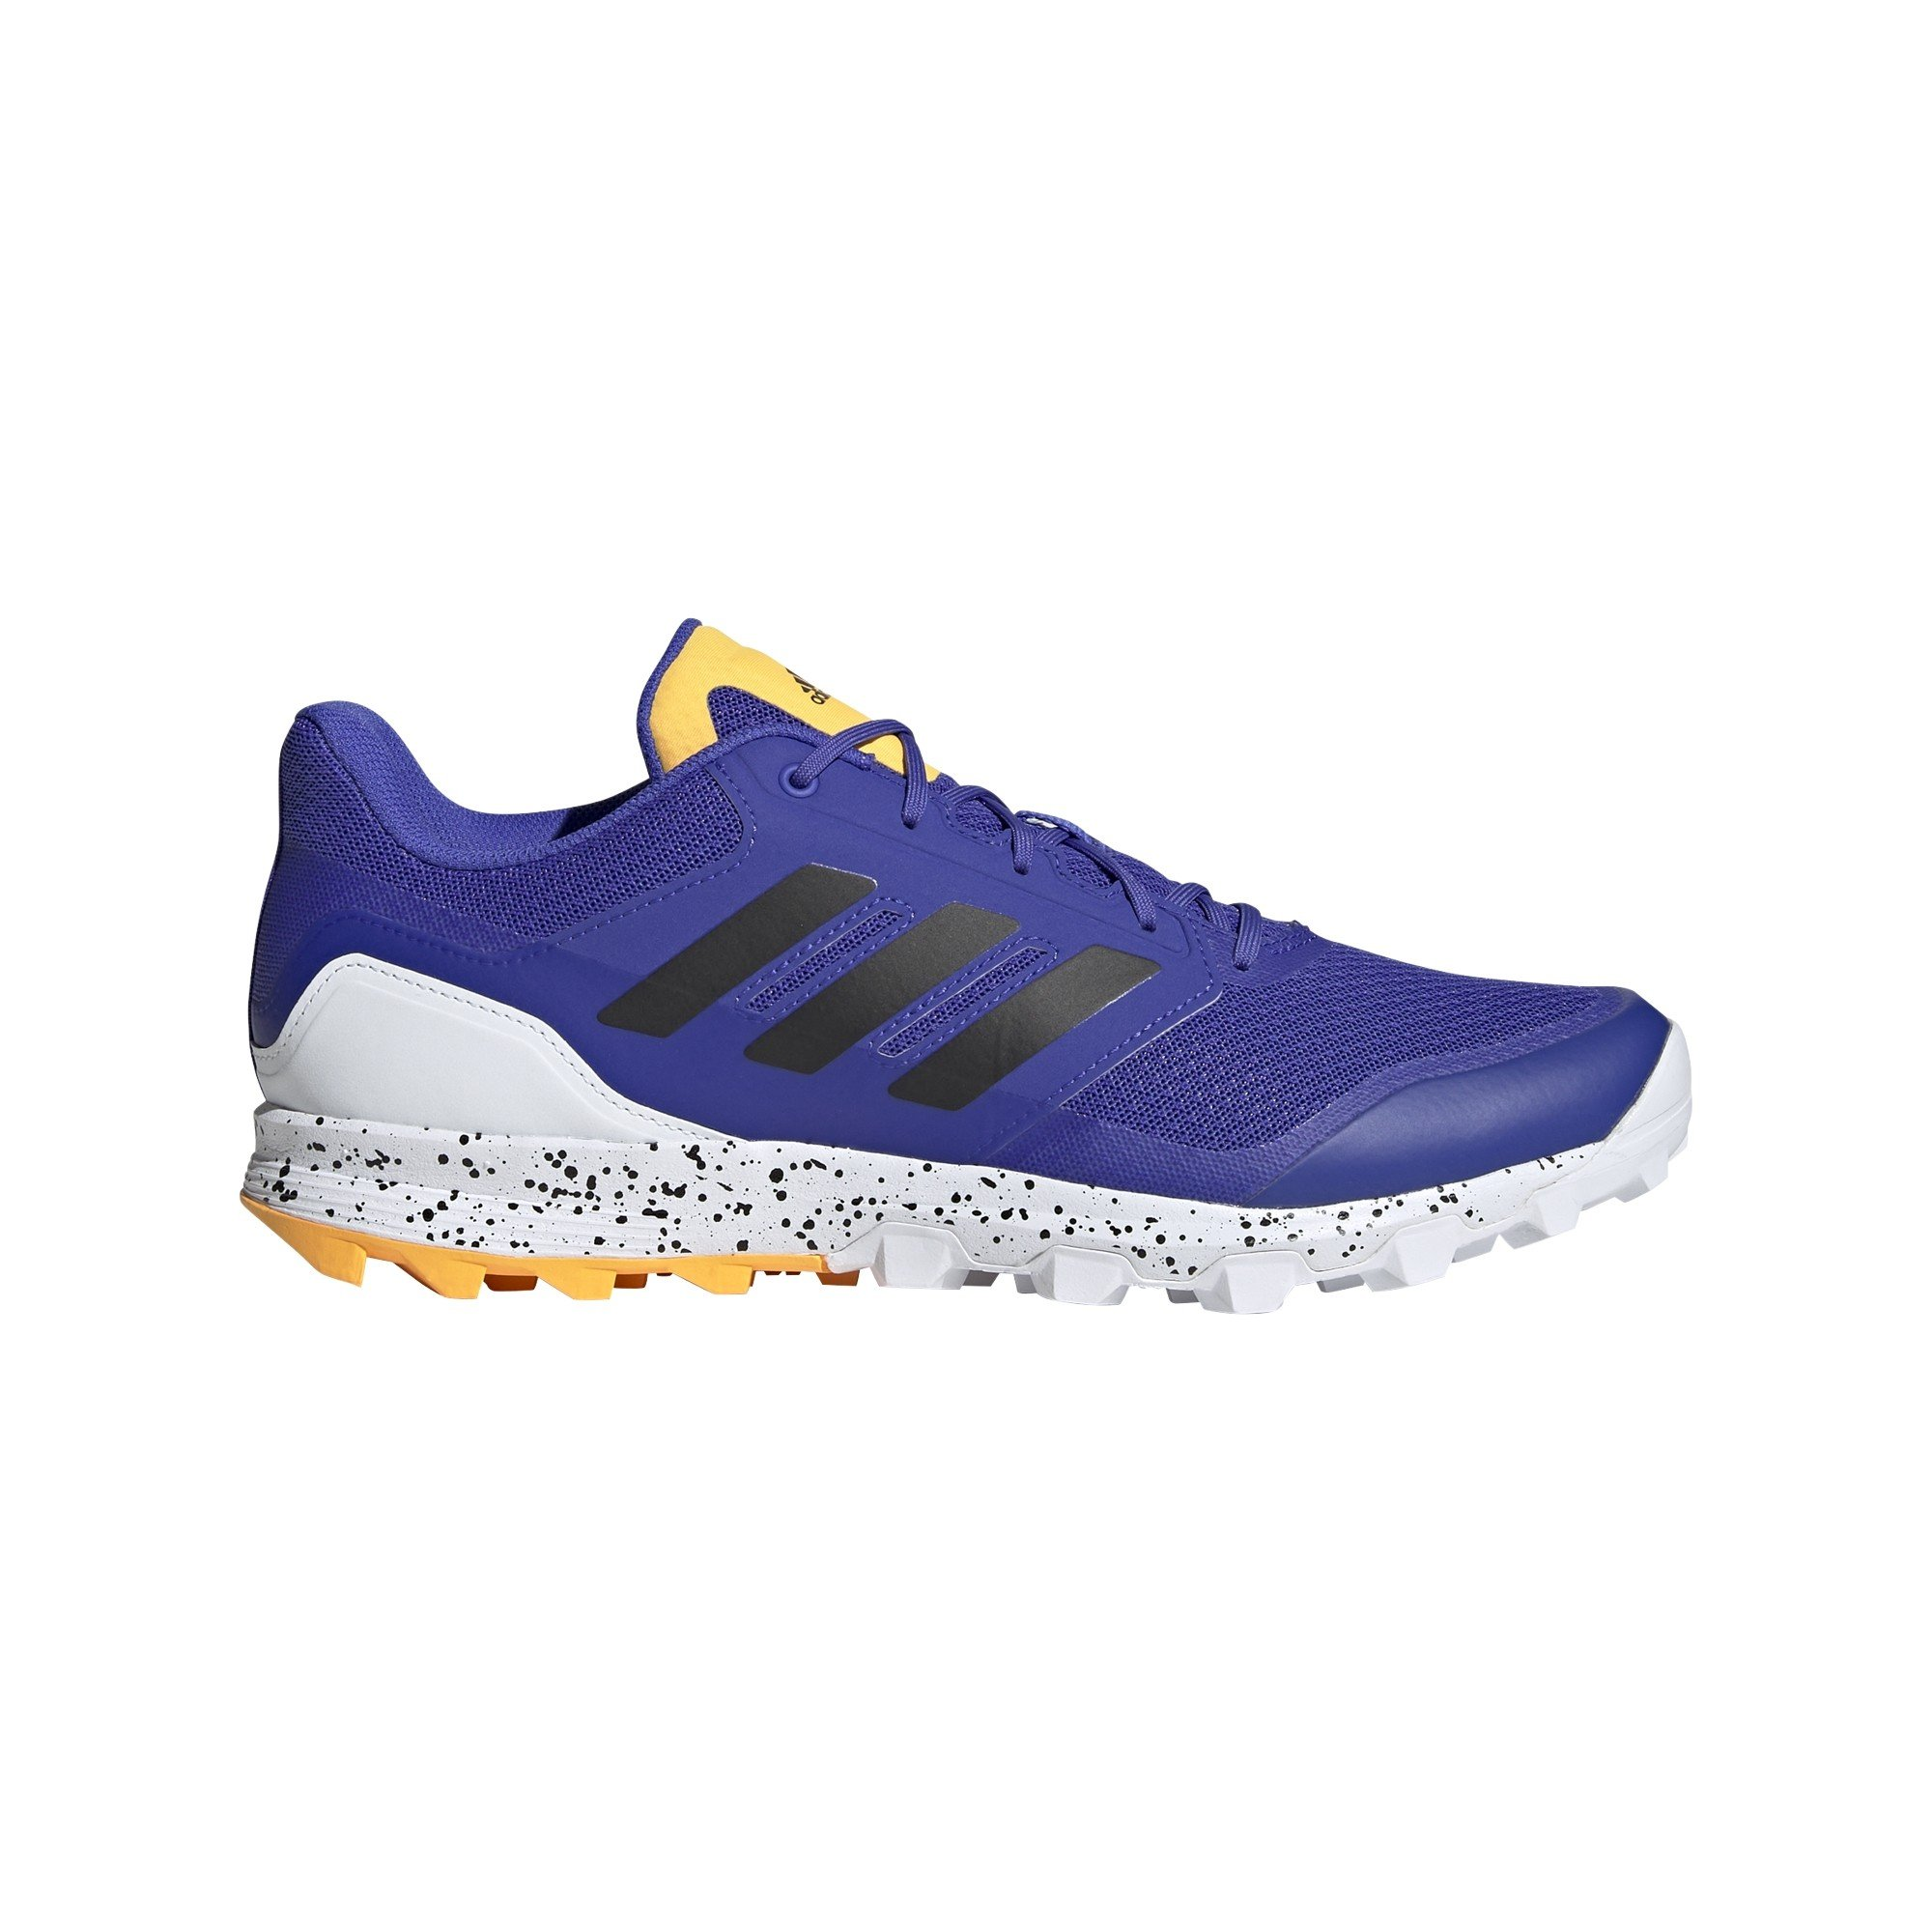 2021/22 Adidas Flexcloud 2.1 Hockey Shoes - Blue/White